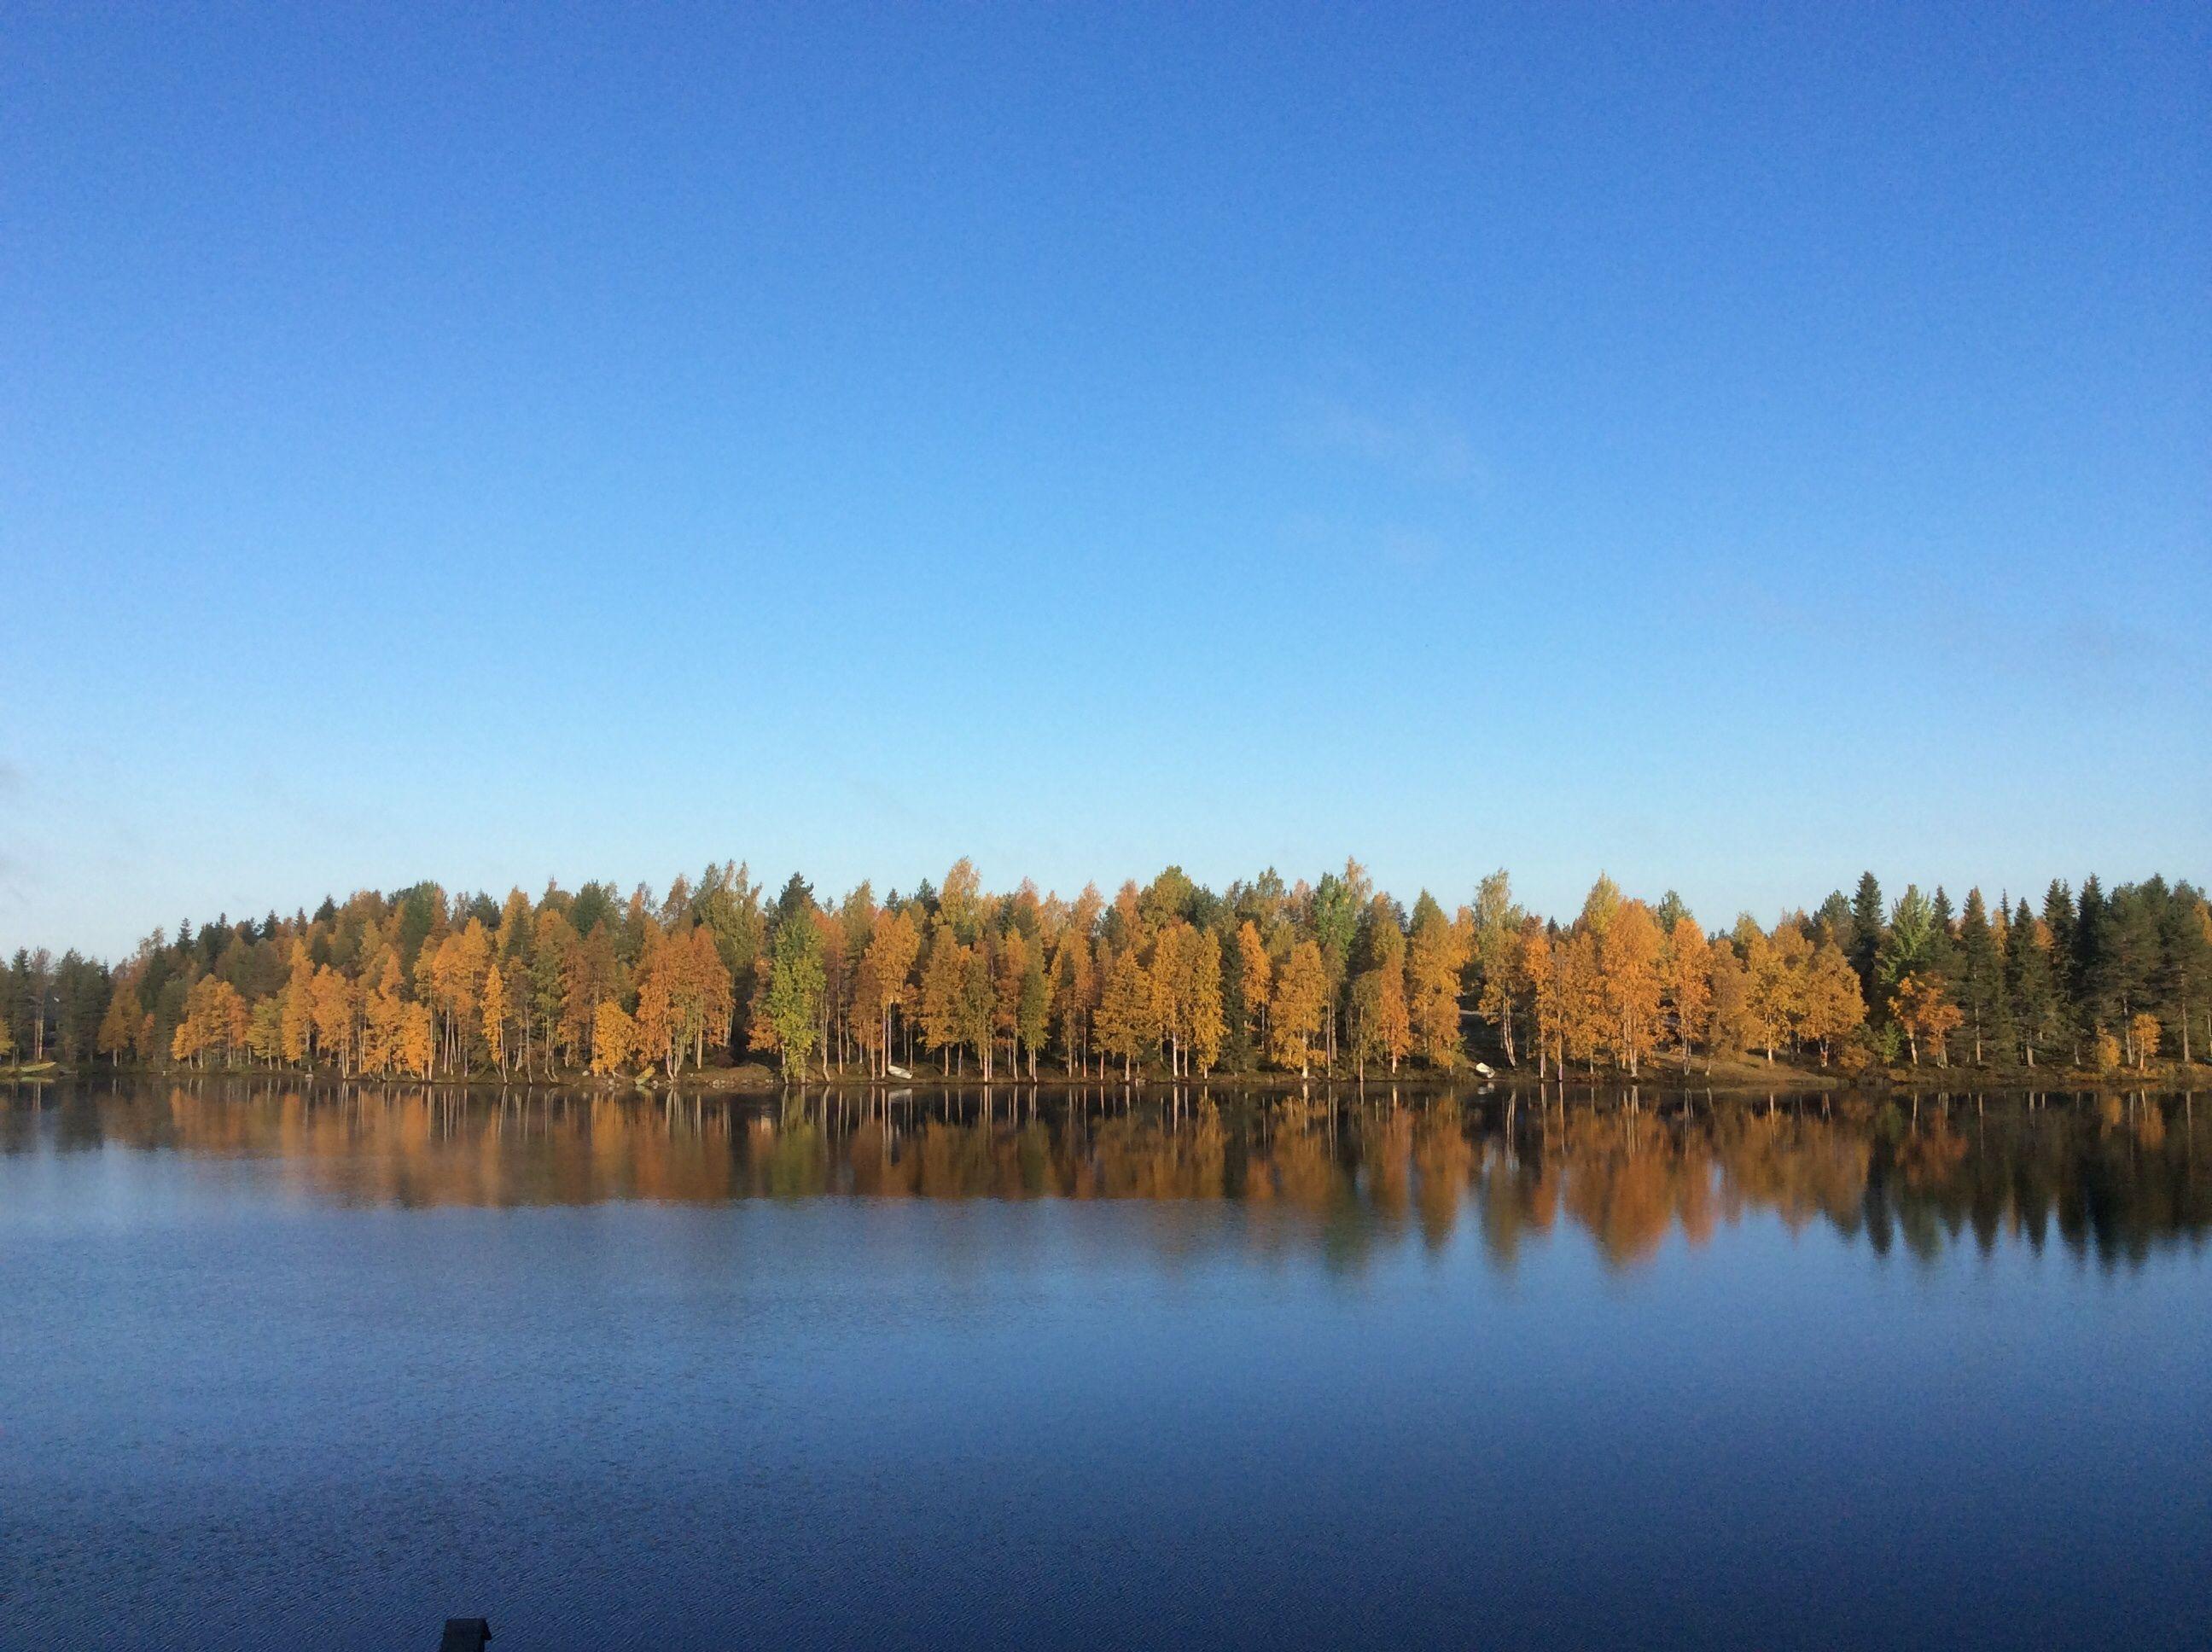 Kuusamo. Syyskuu 2014.